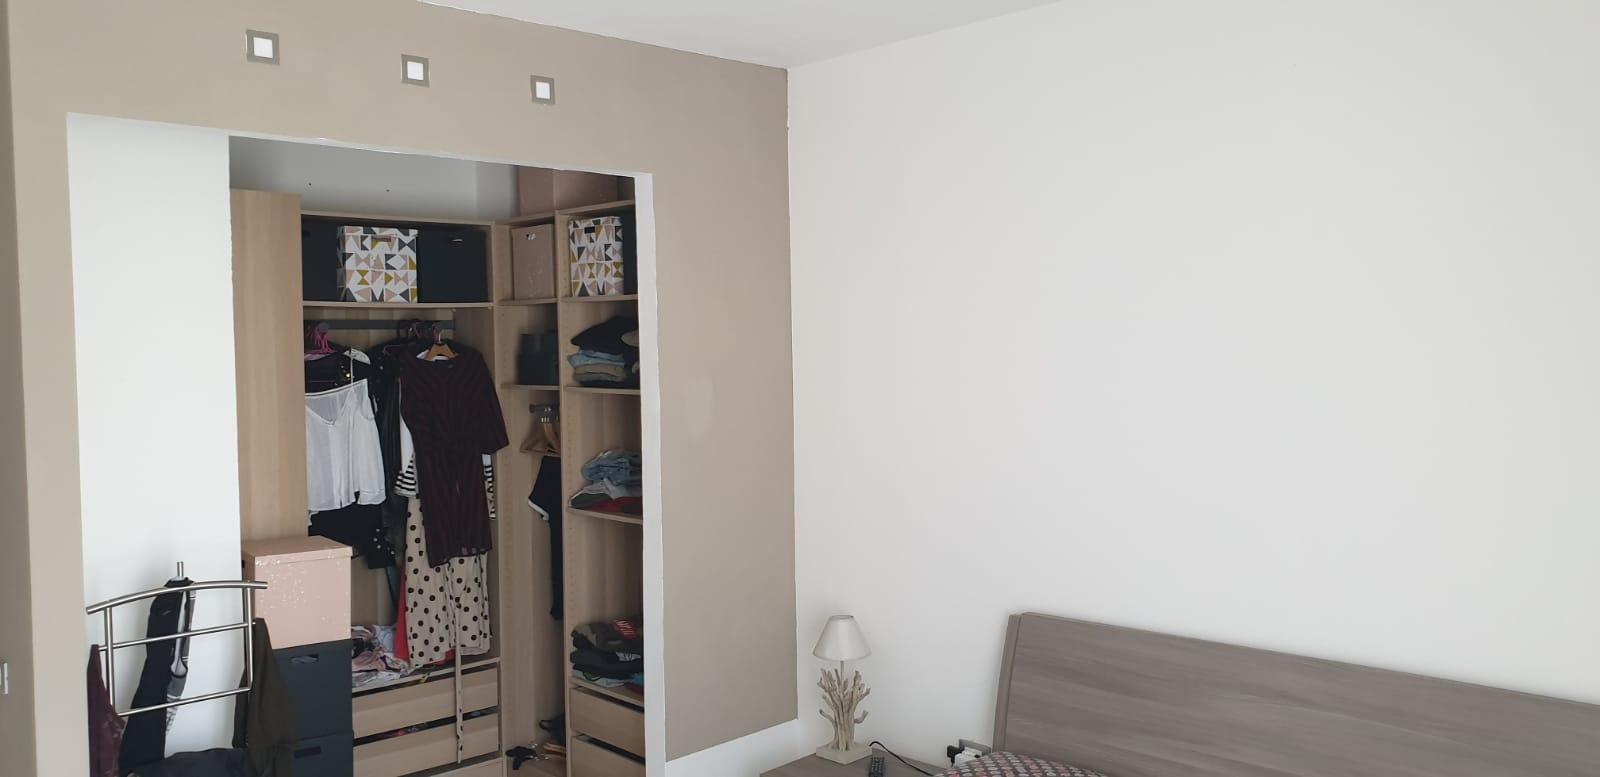 6 cabina armadio